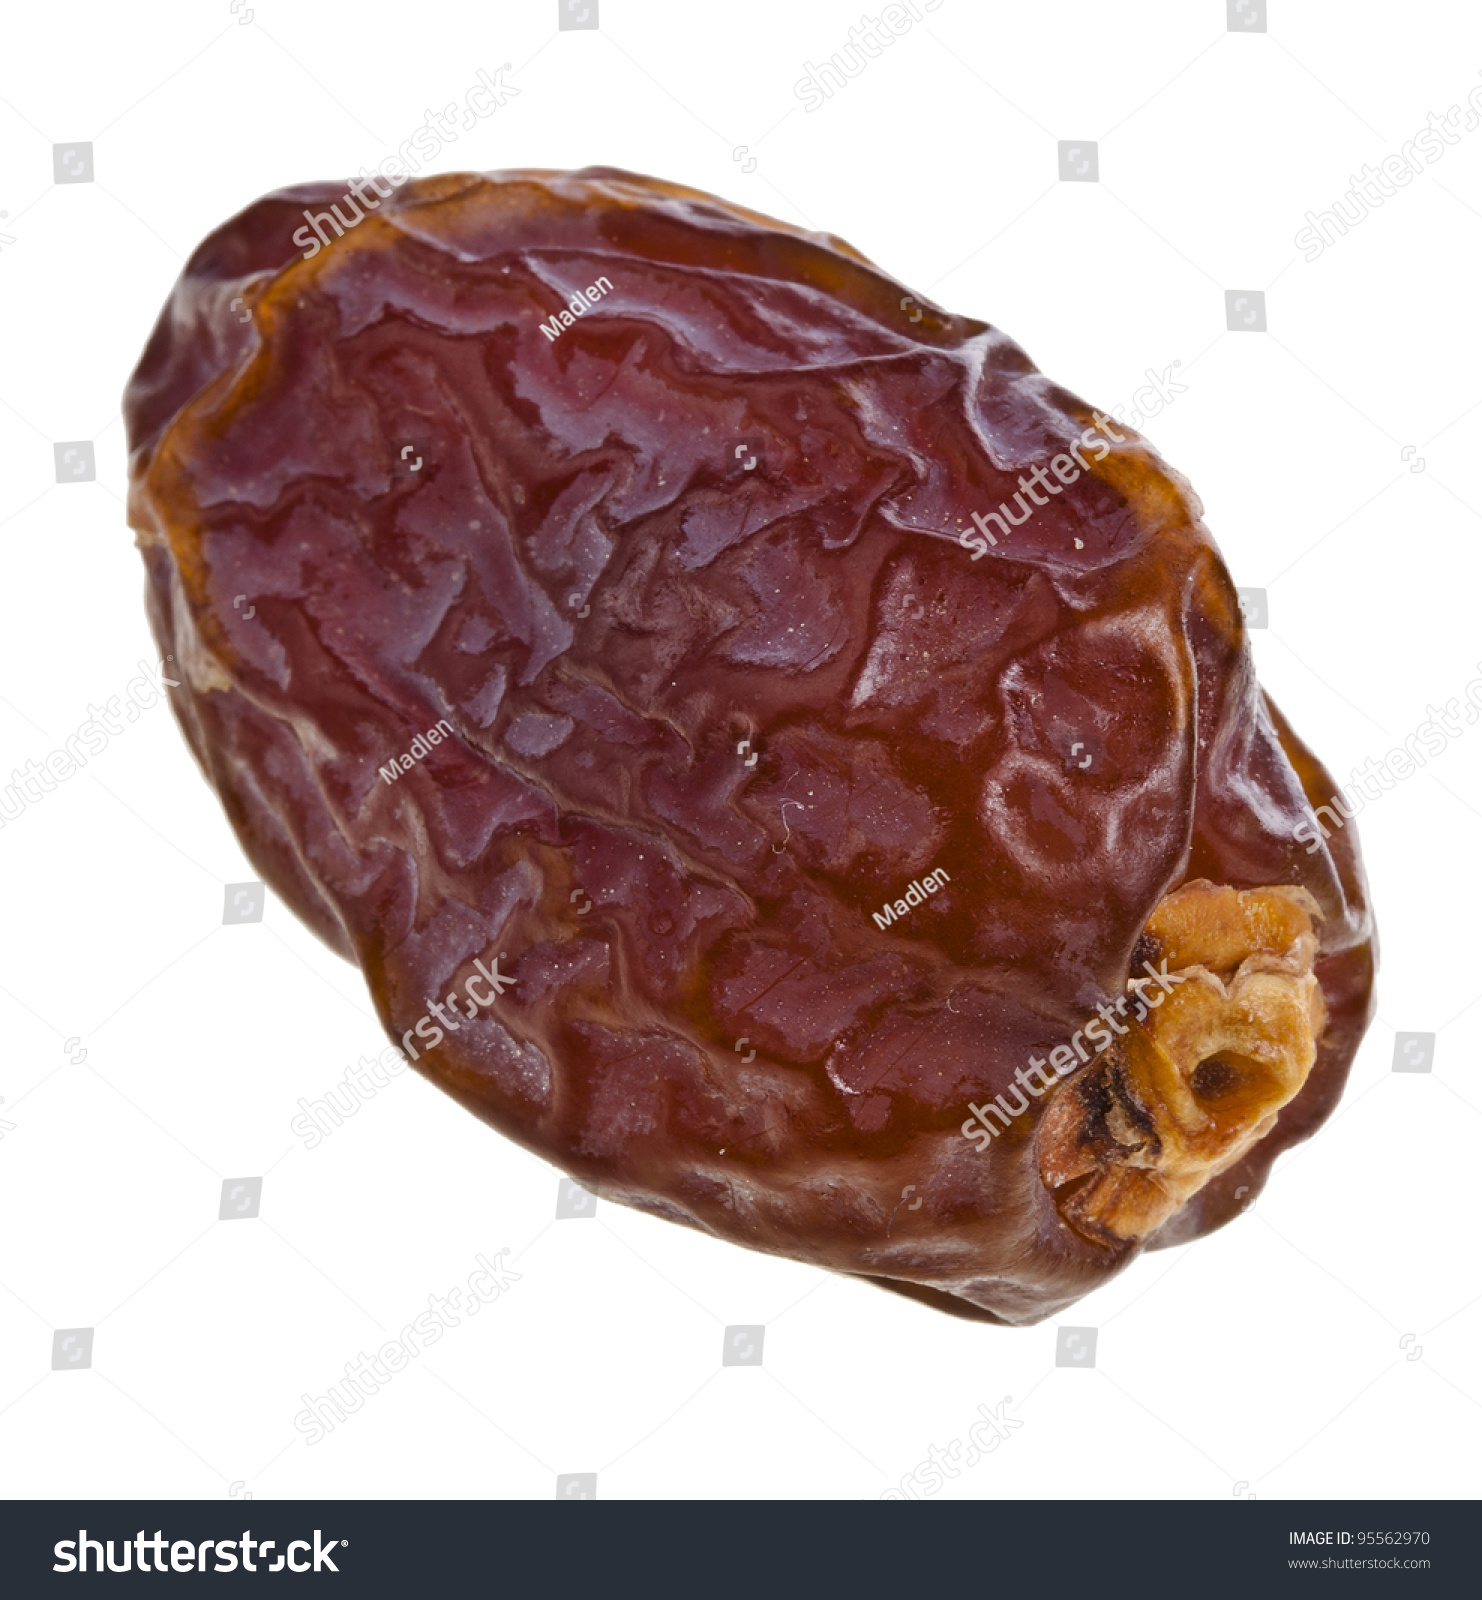 dating single dates fruit